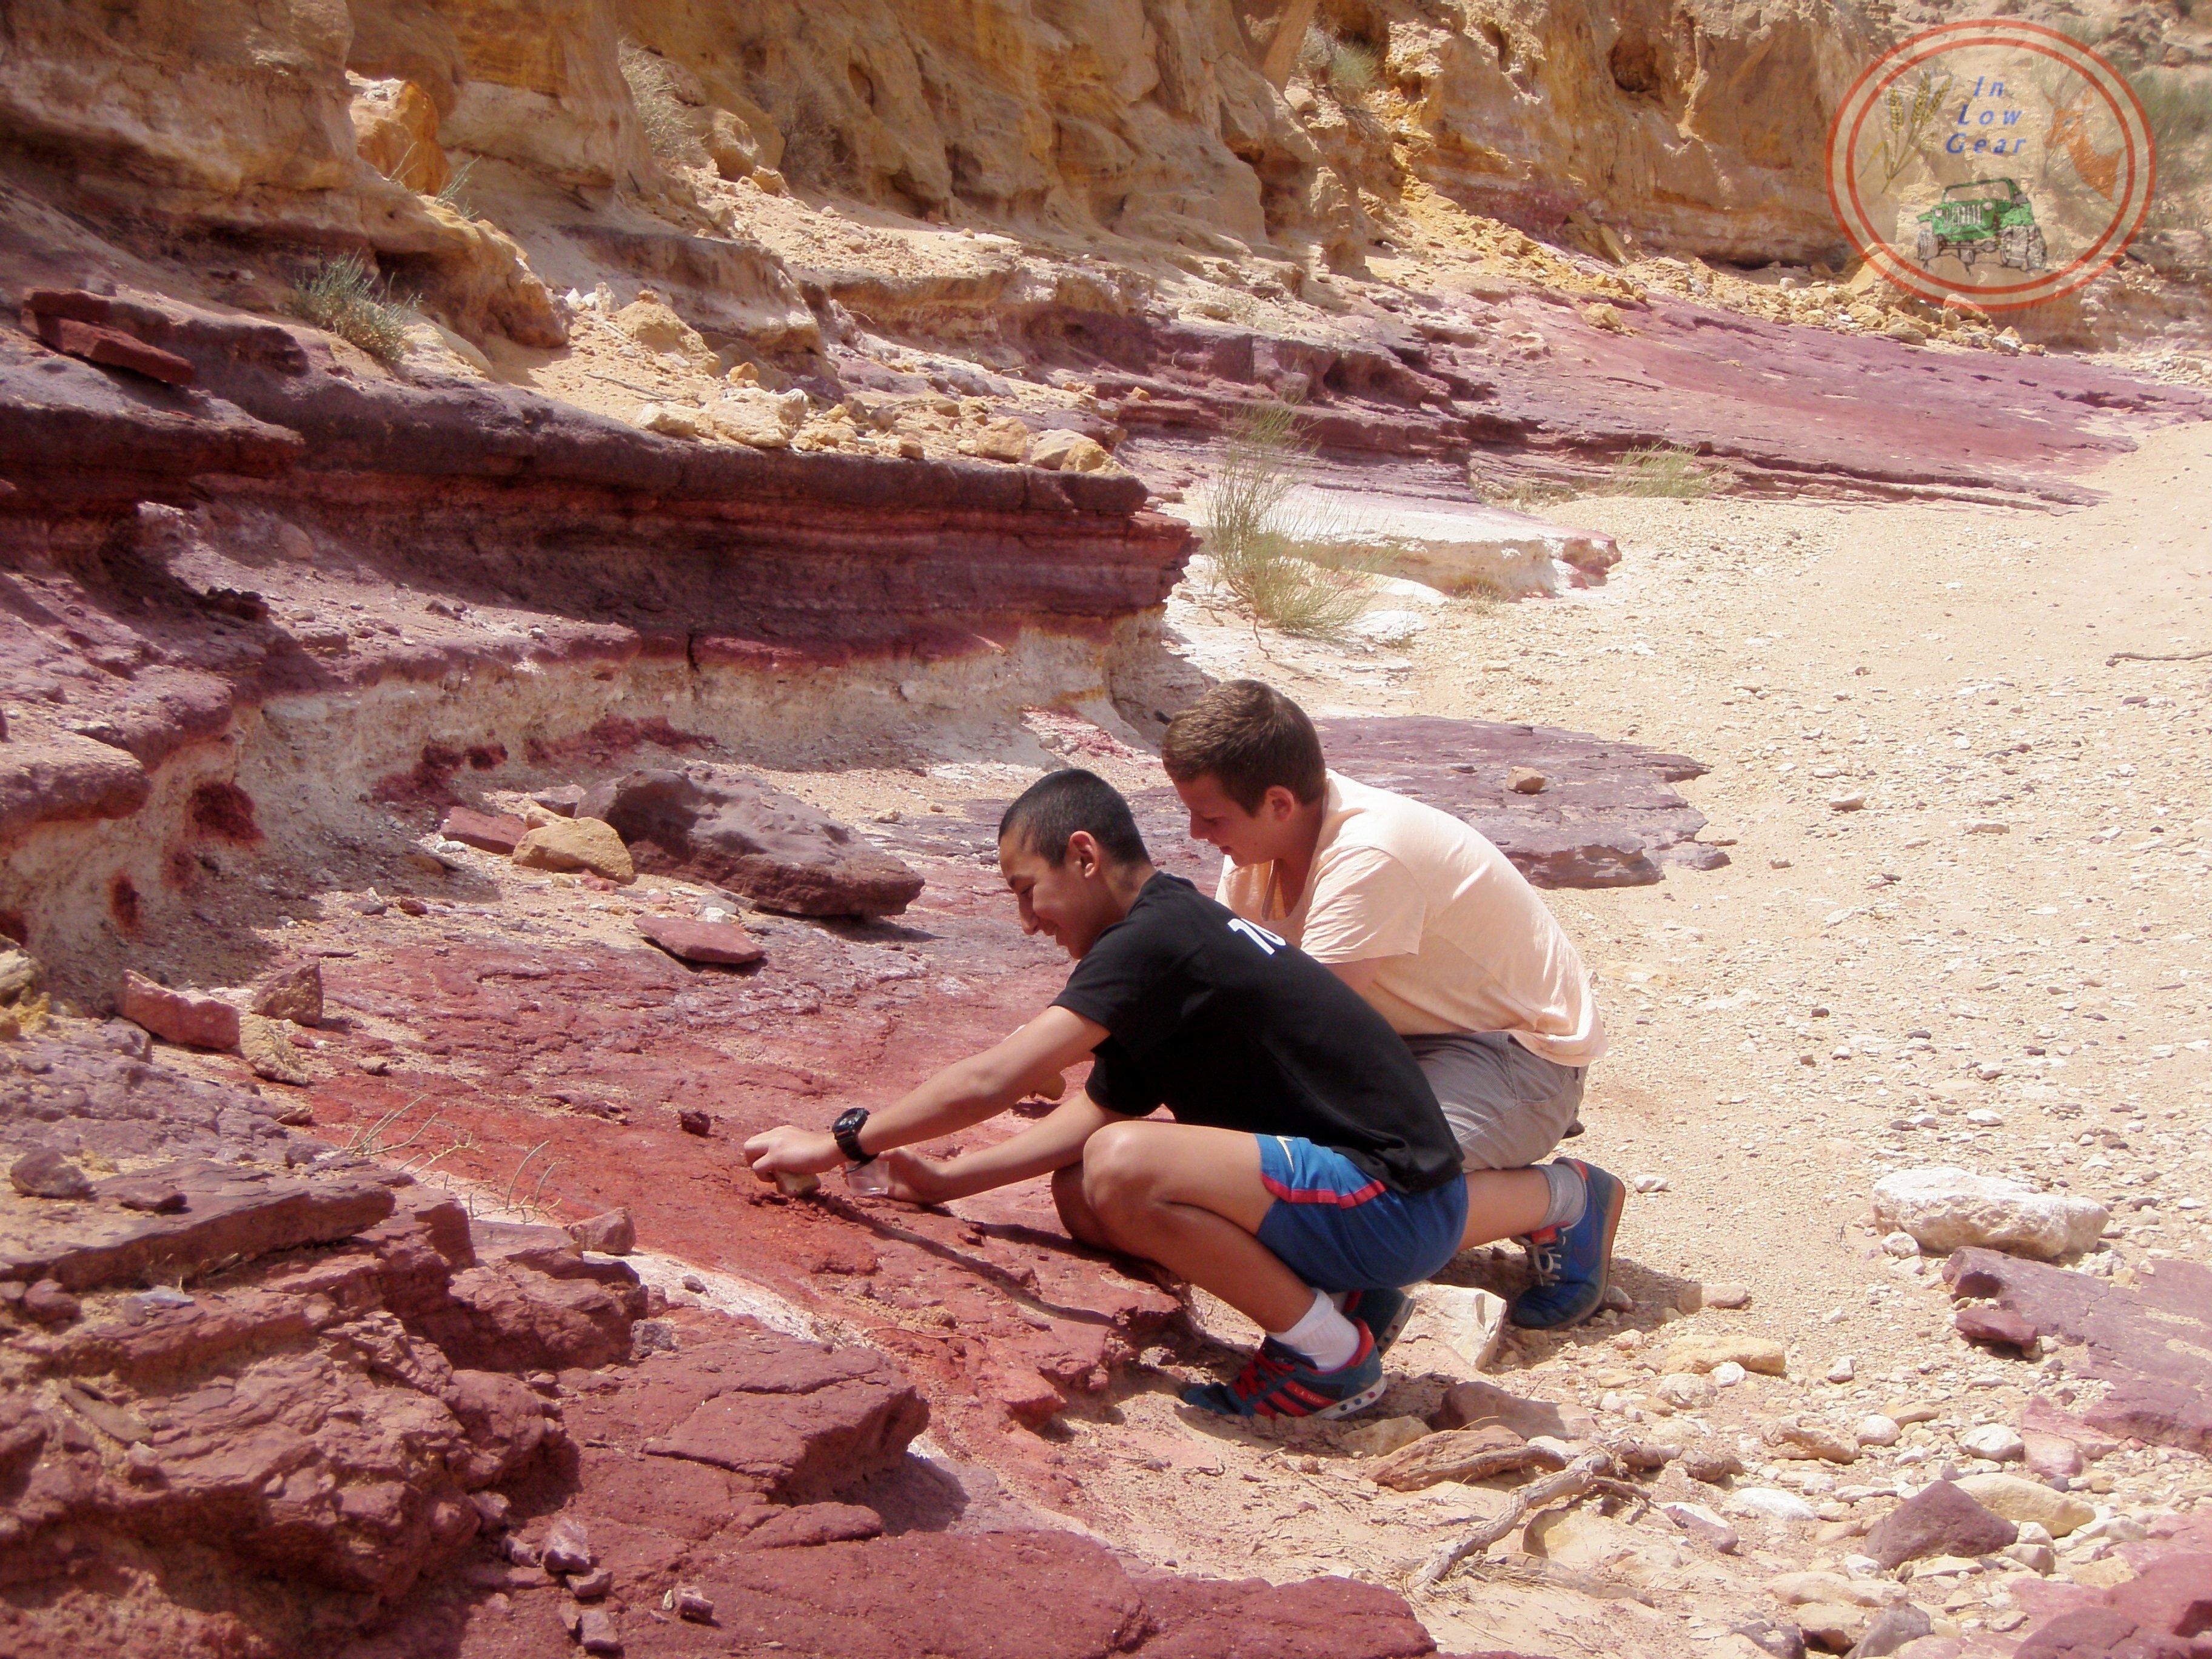 Machtesh Chatira colored sand. חולות צבעוניים במכתש חתירה הגדול